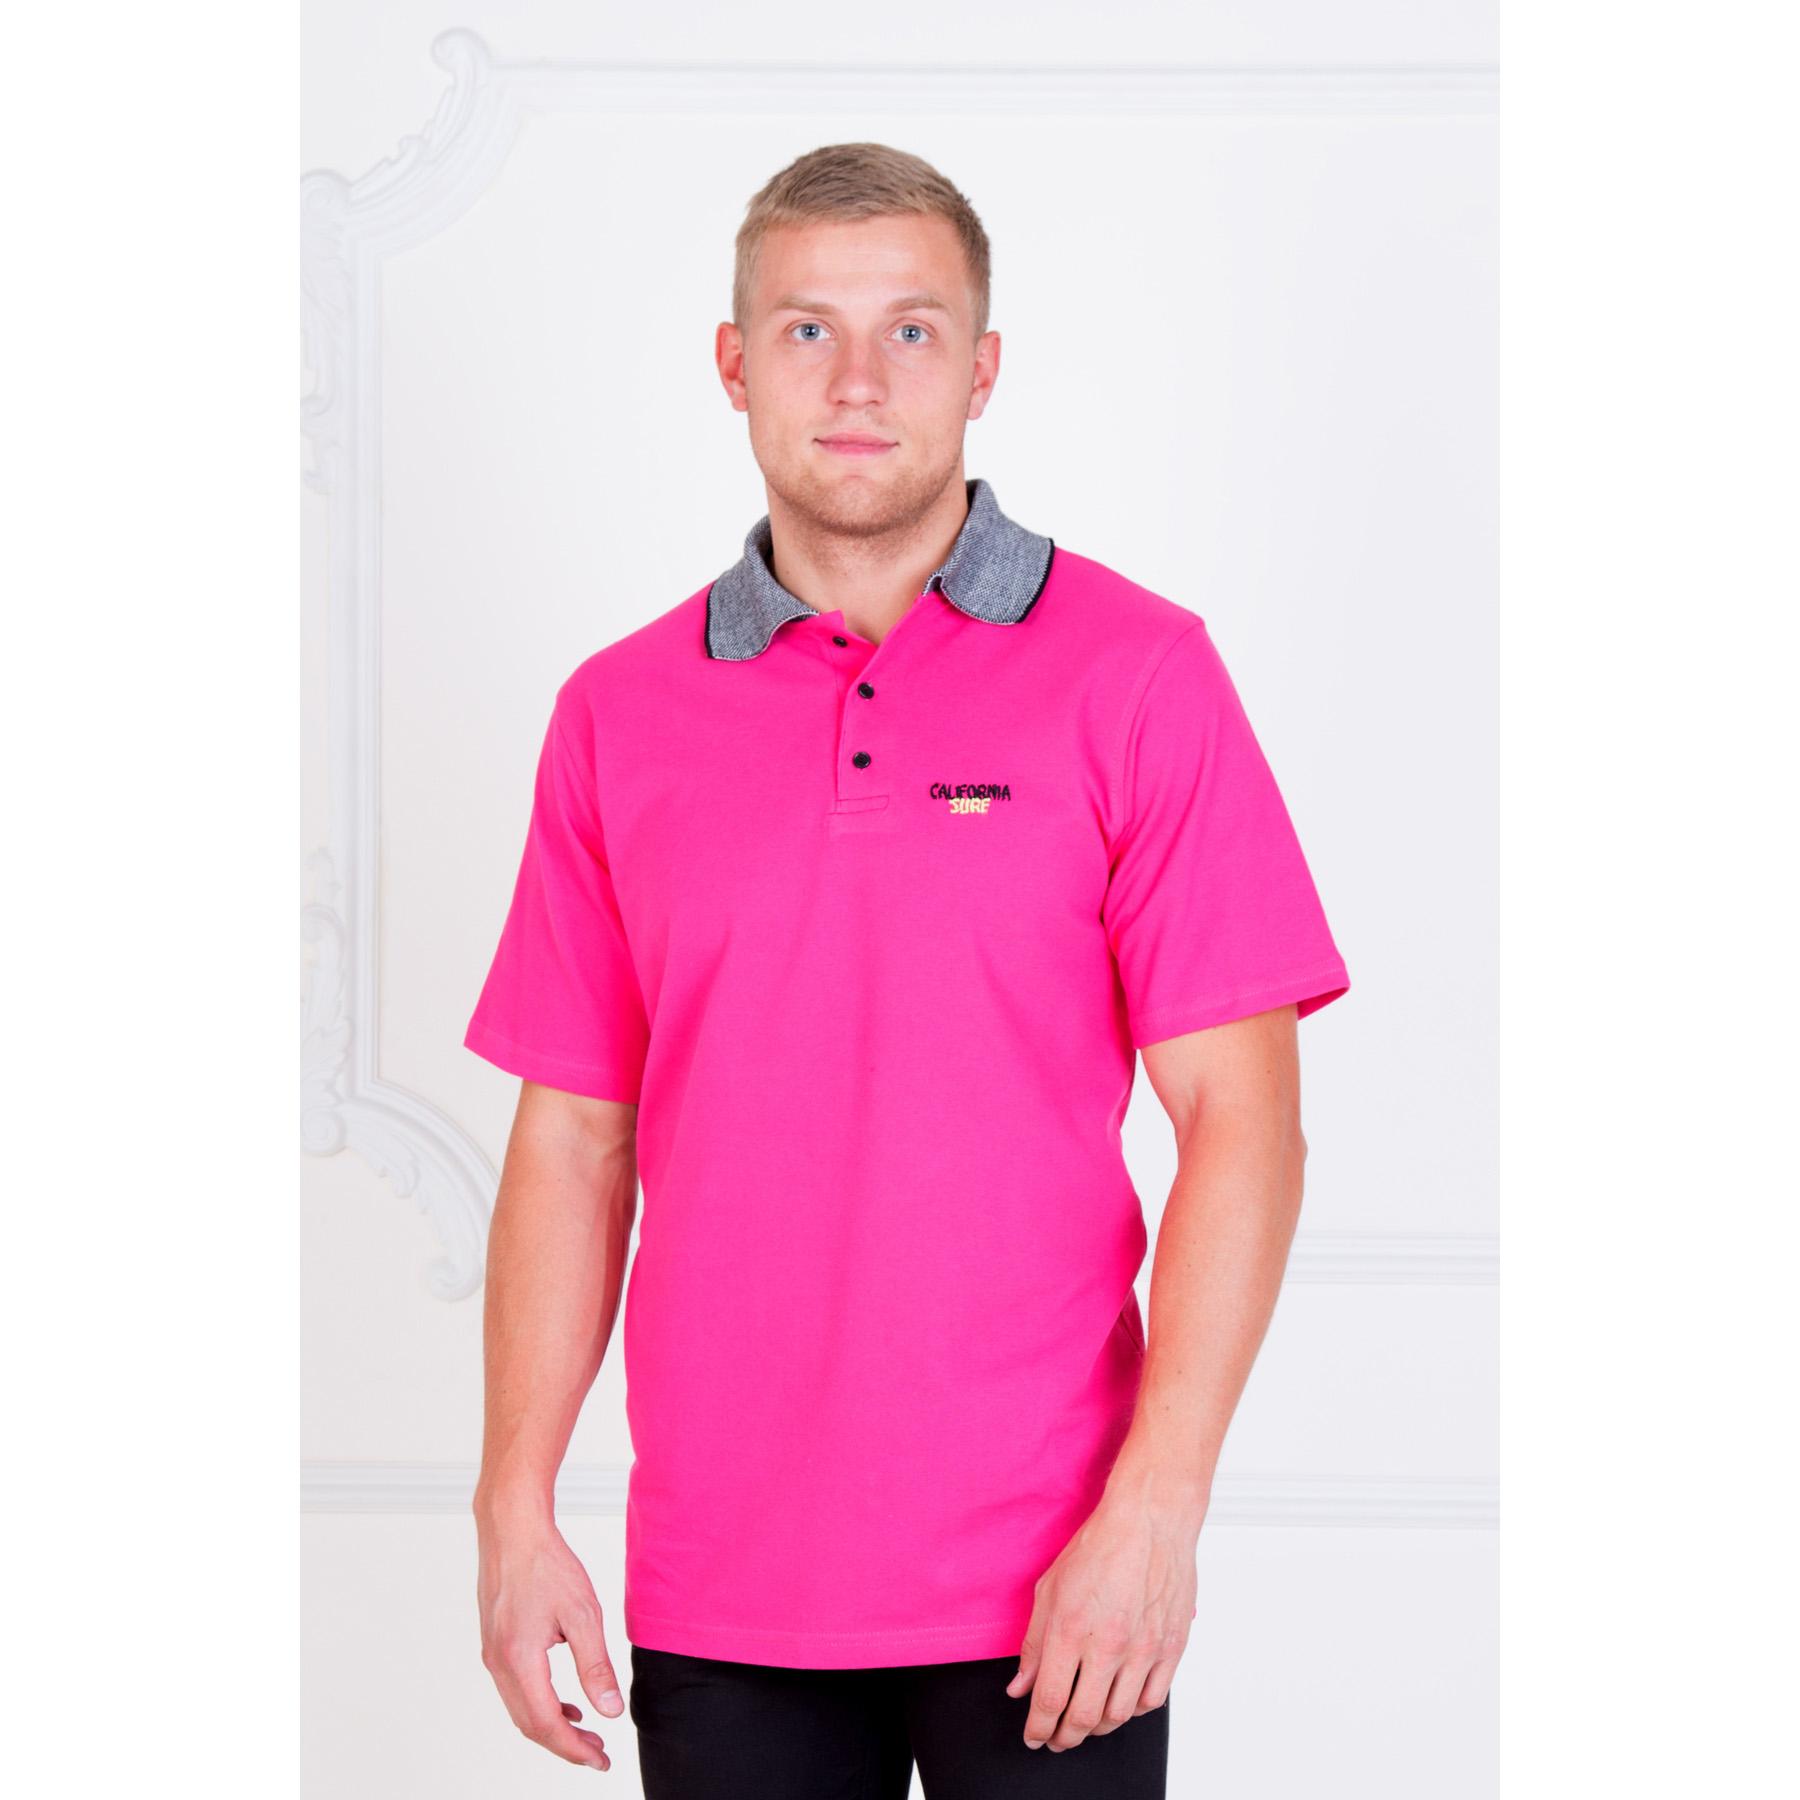 Мужская футболка-поло  California Surf  Малиновый, размер 46 - Мужская одежда артикул: 16471